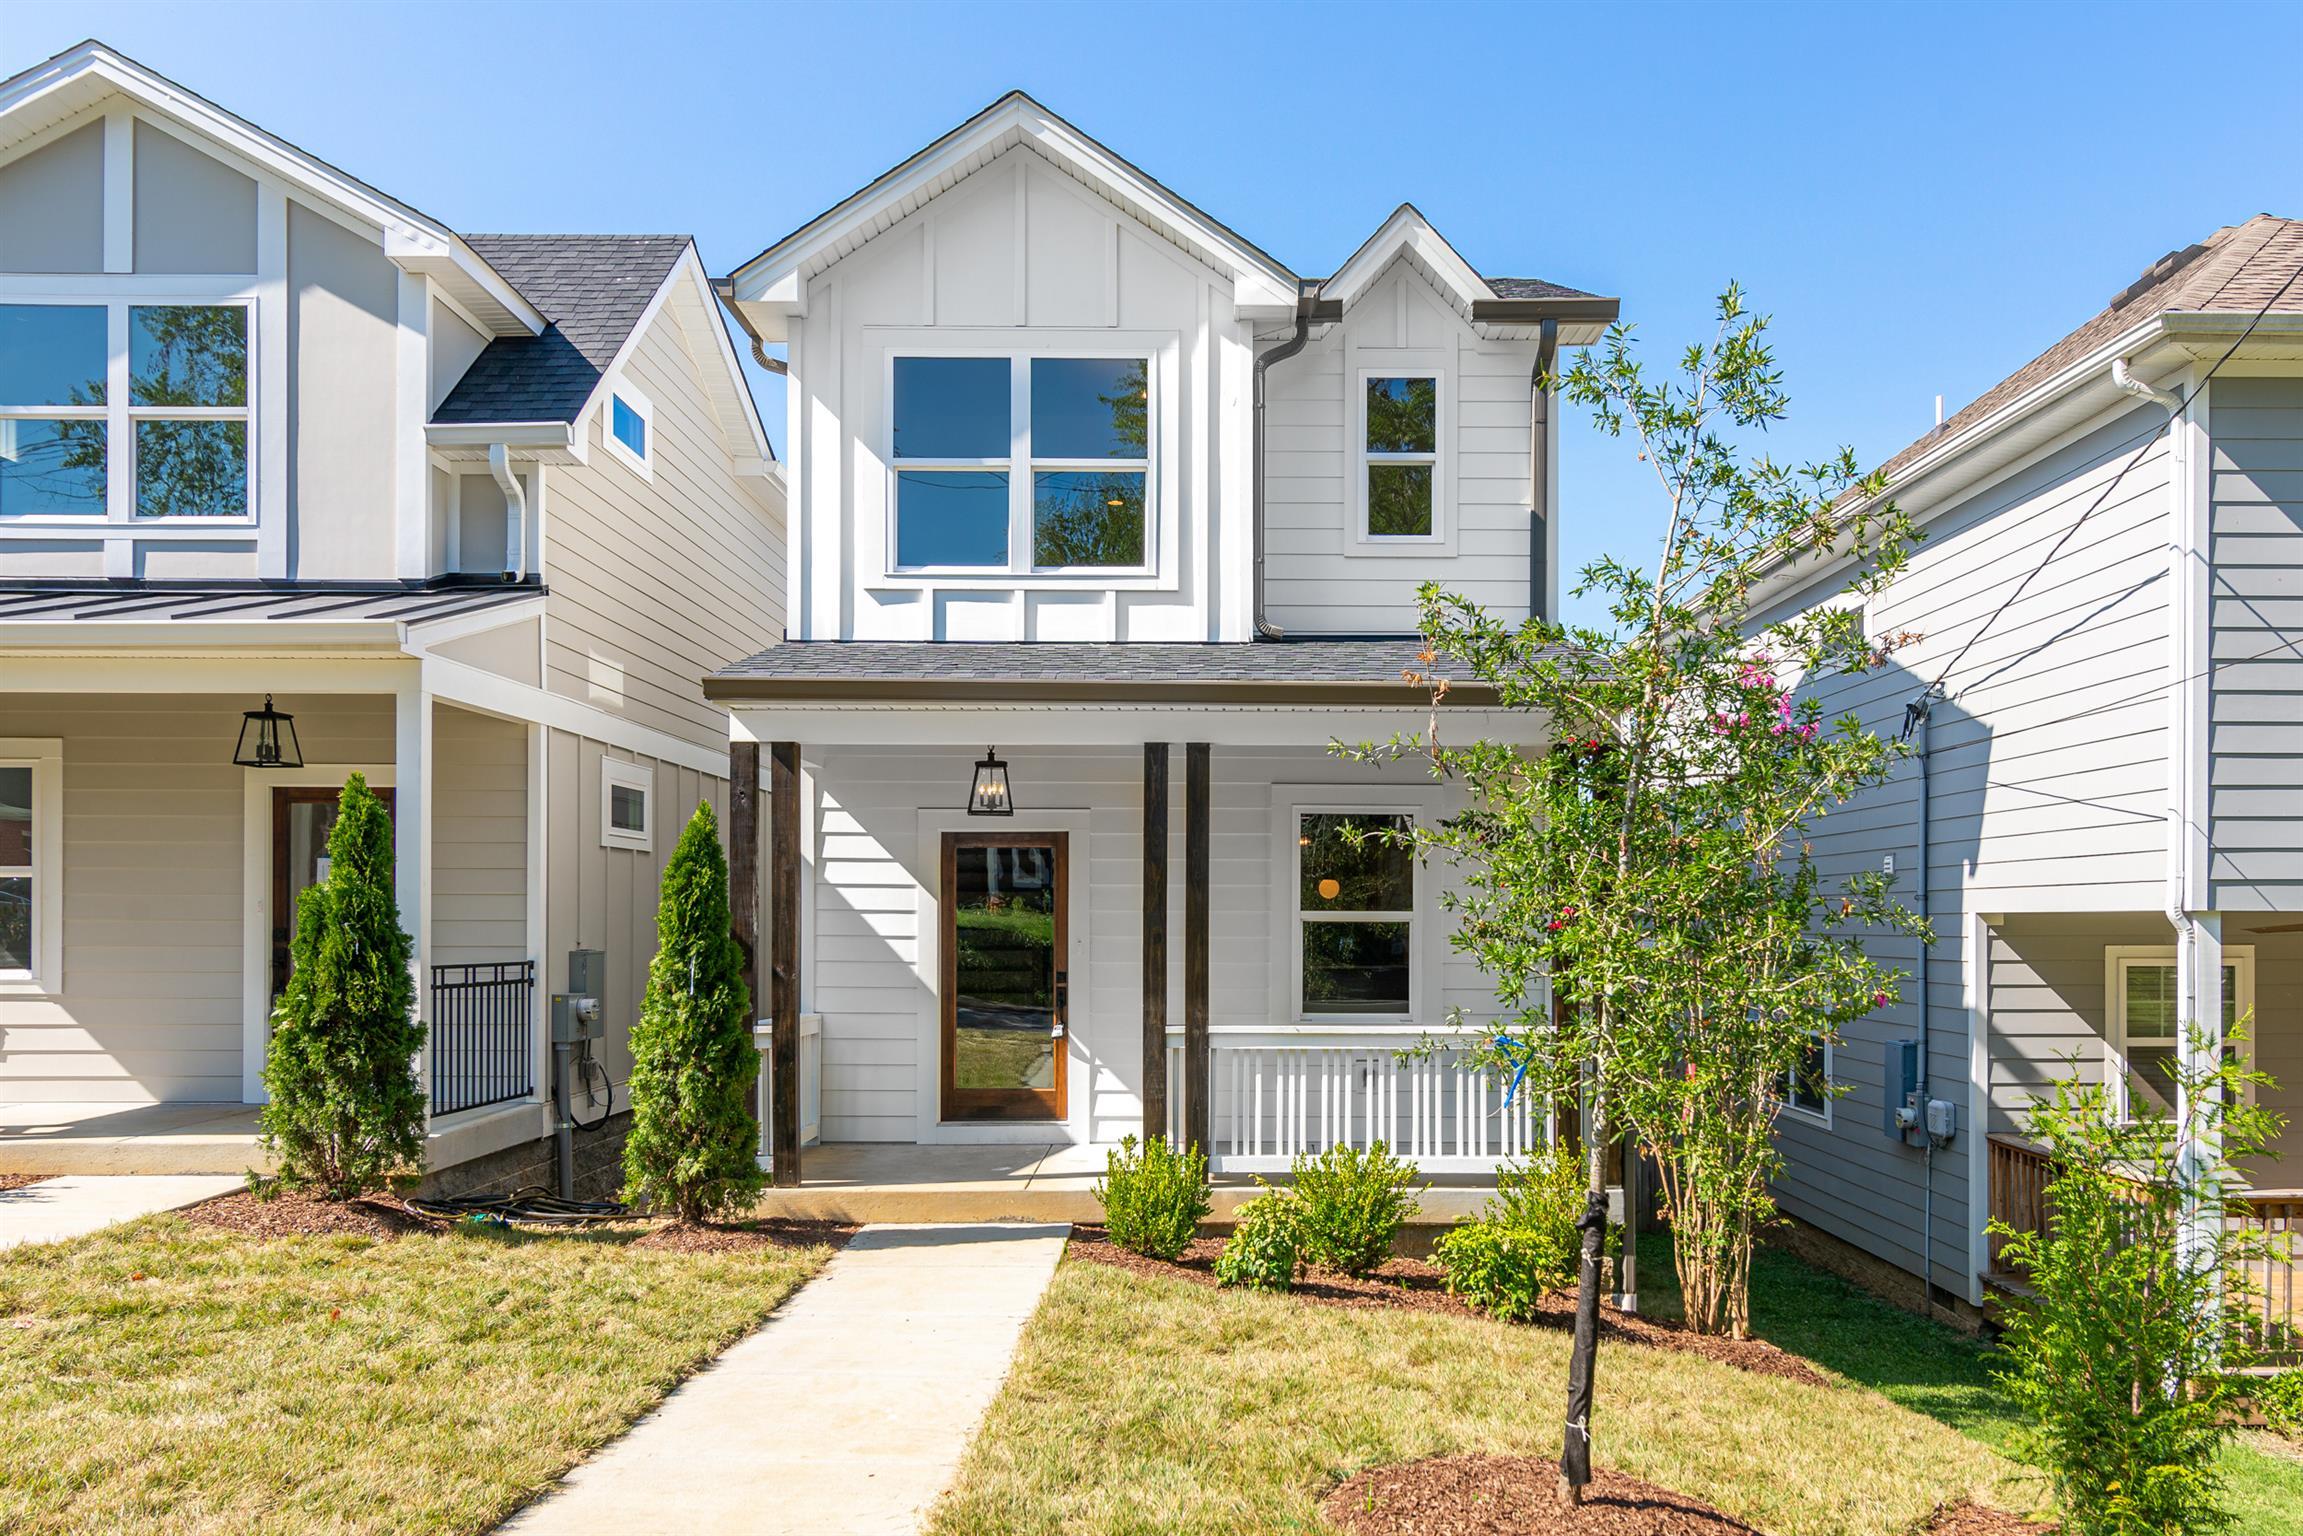 1716A McKinney Ave, Nashville, TN 37208 - Nashville, TN real estate listing